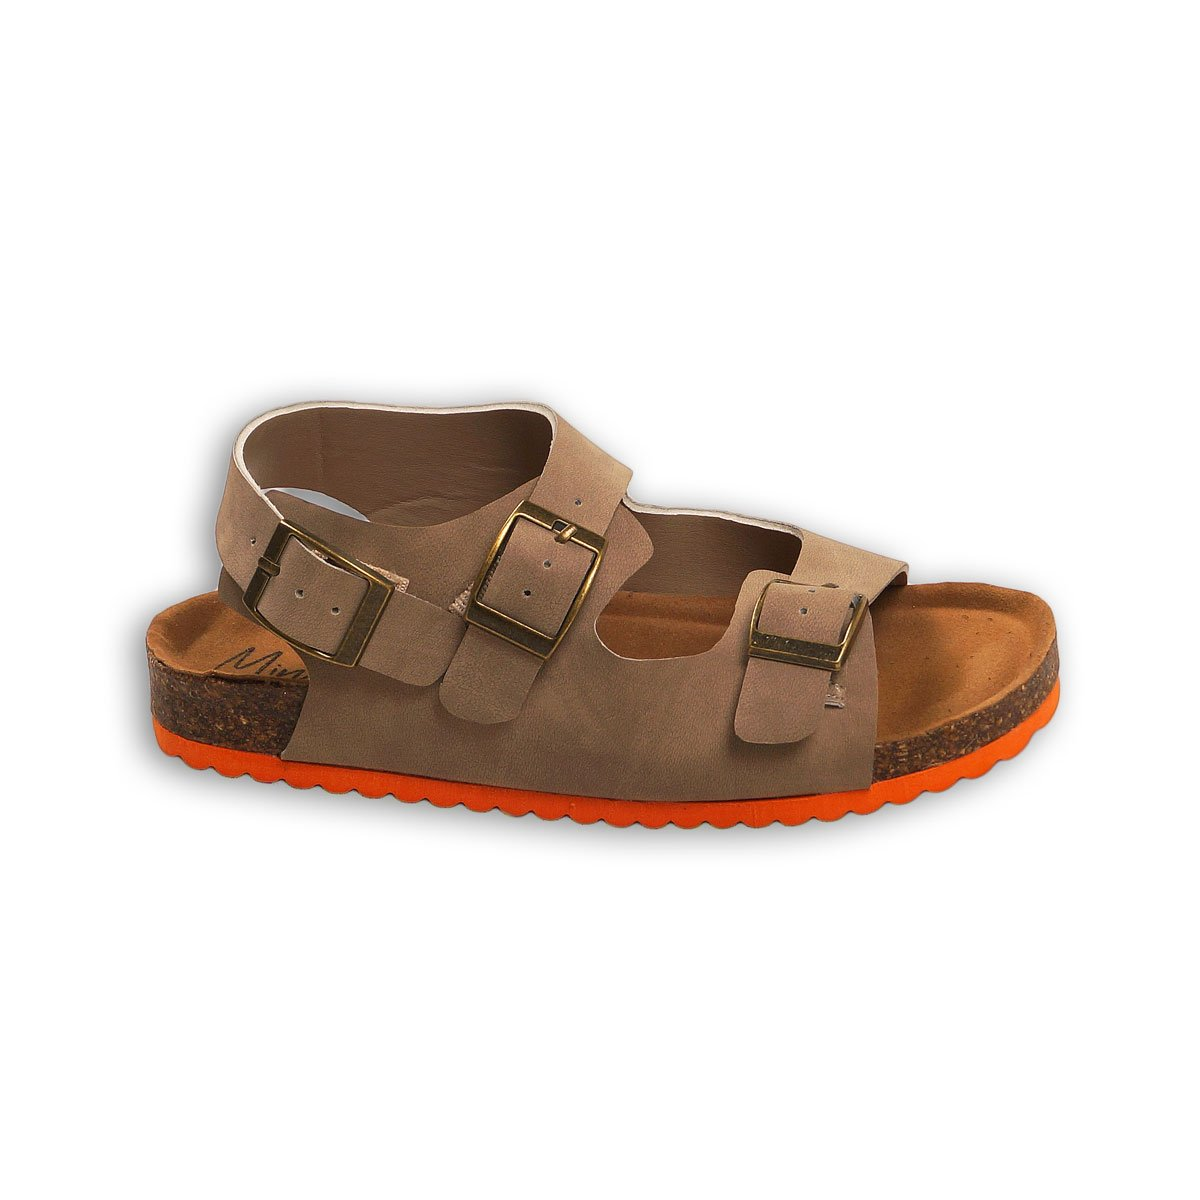 Sandale in curele duble cu catarame, Minoti Shoe